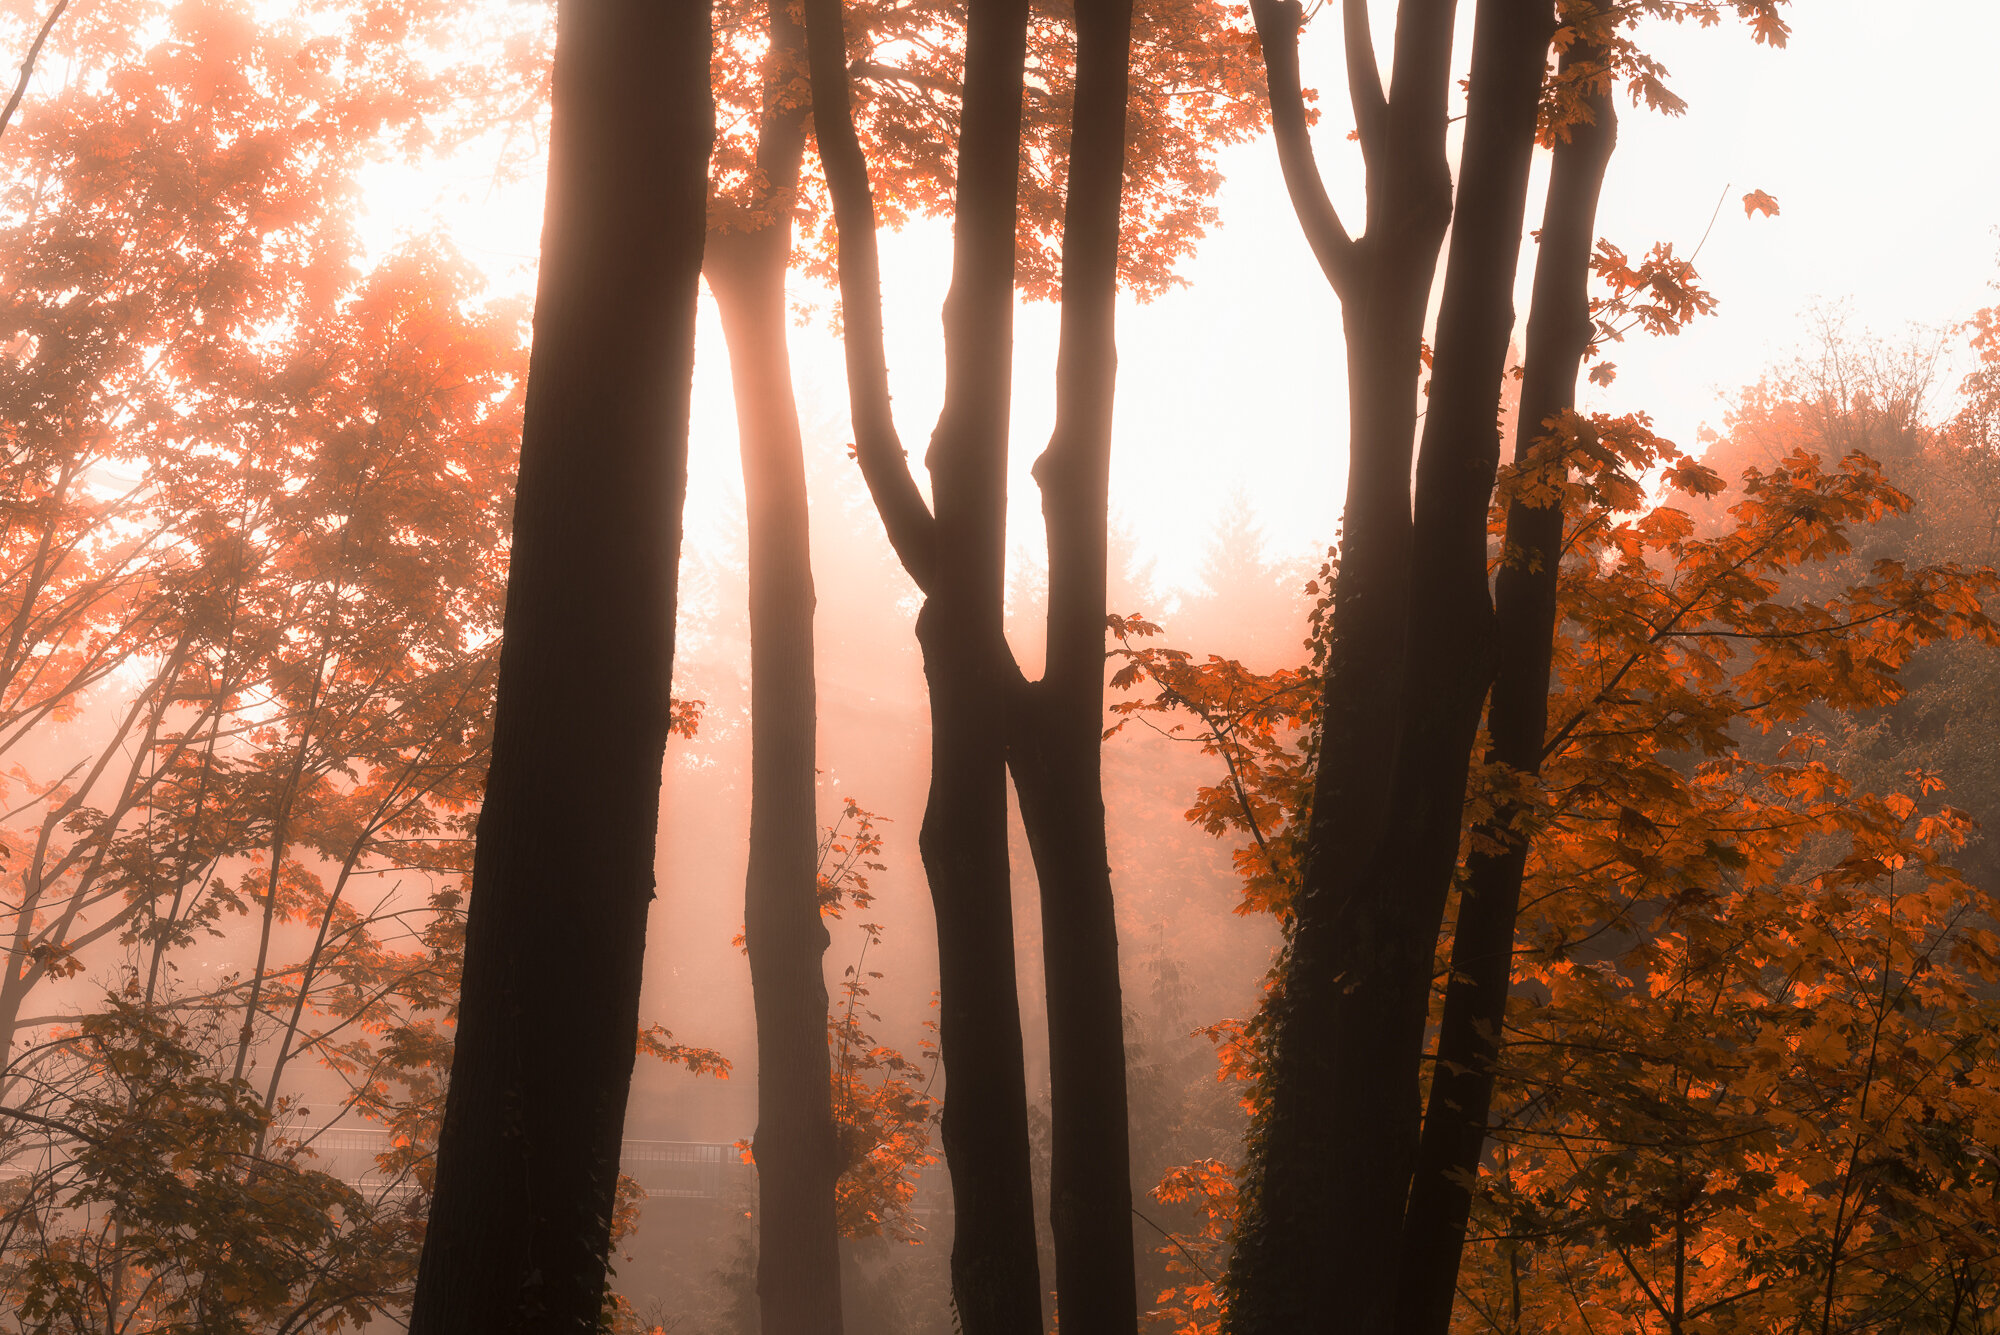 Fine Art Photography: 'Through the Mist'